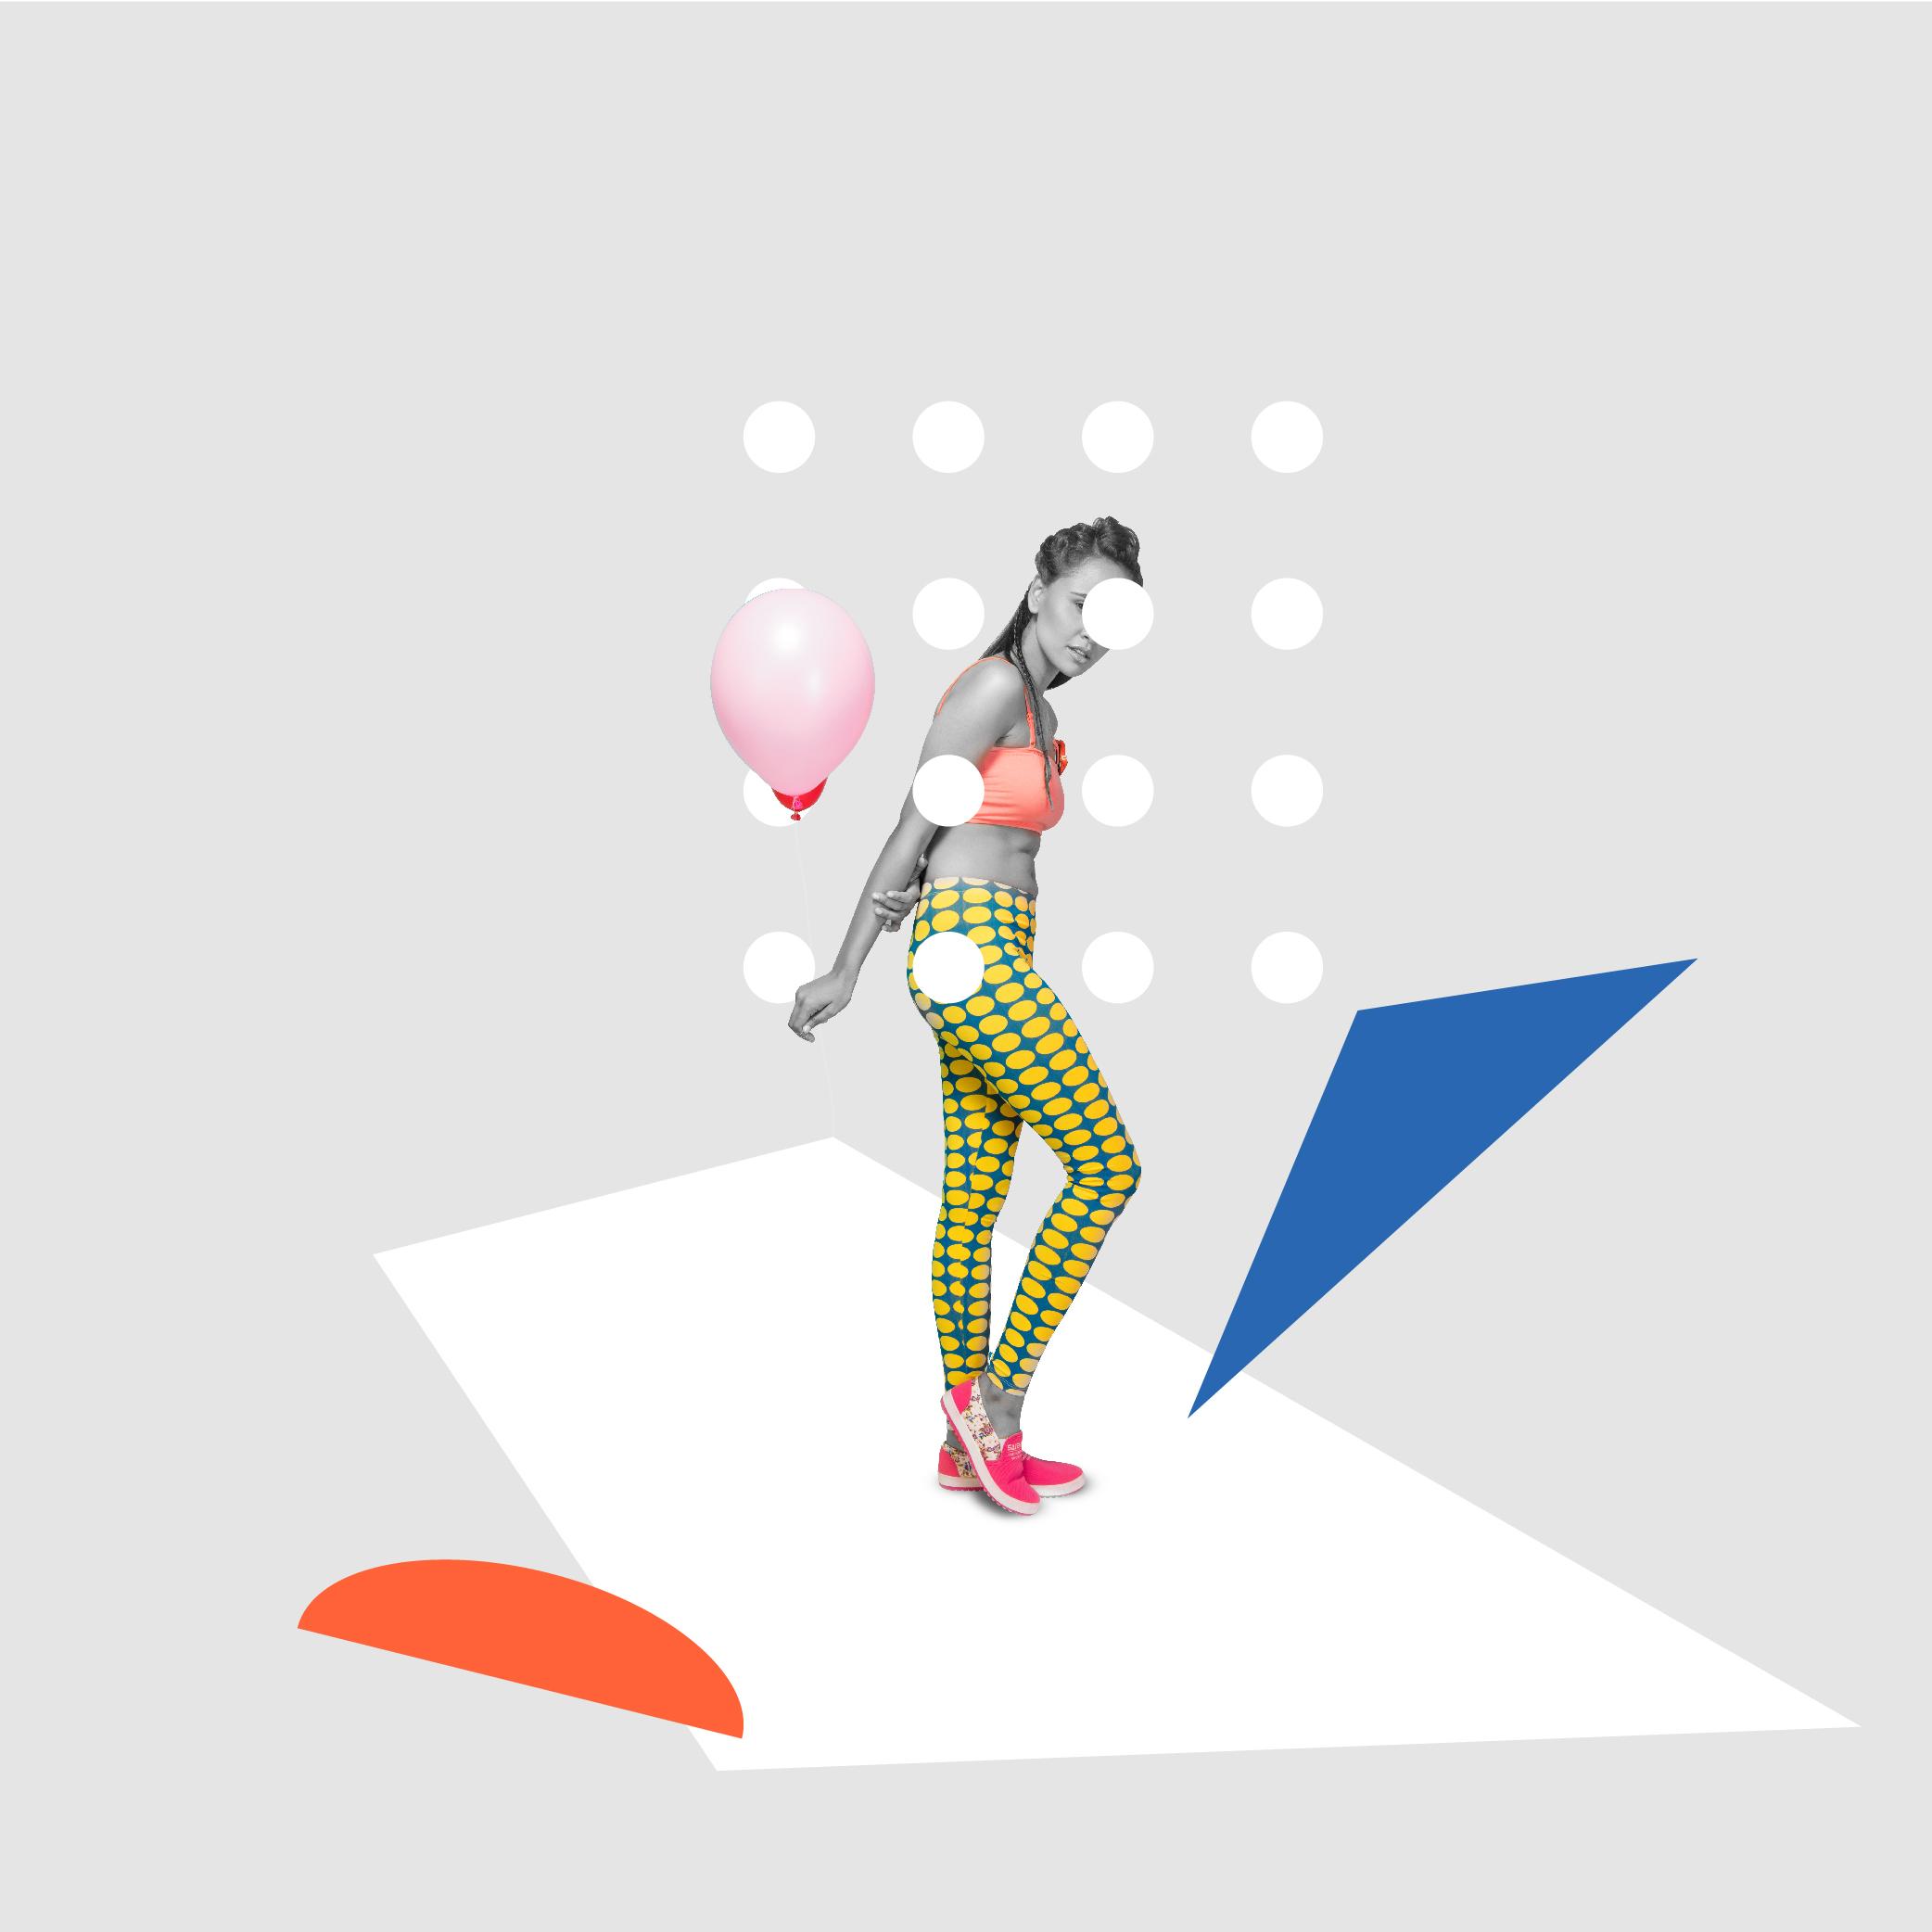 Chhandak Pradhan-Fashion-Femorra-Brand Campaign-03.jpg